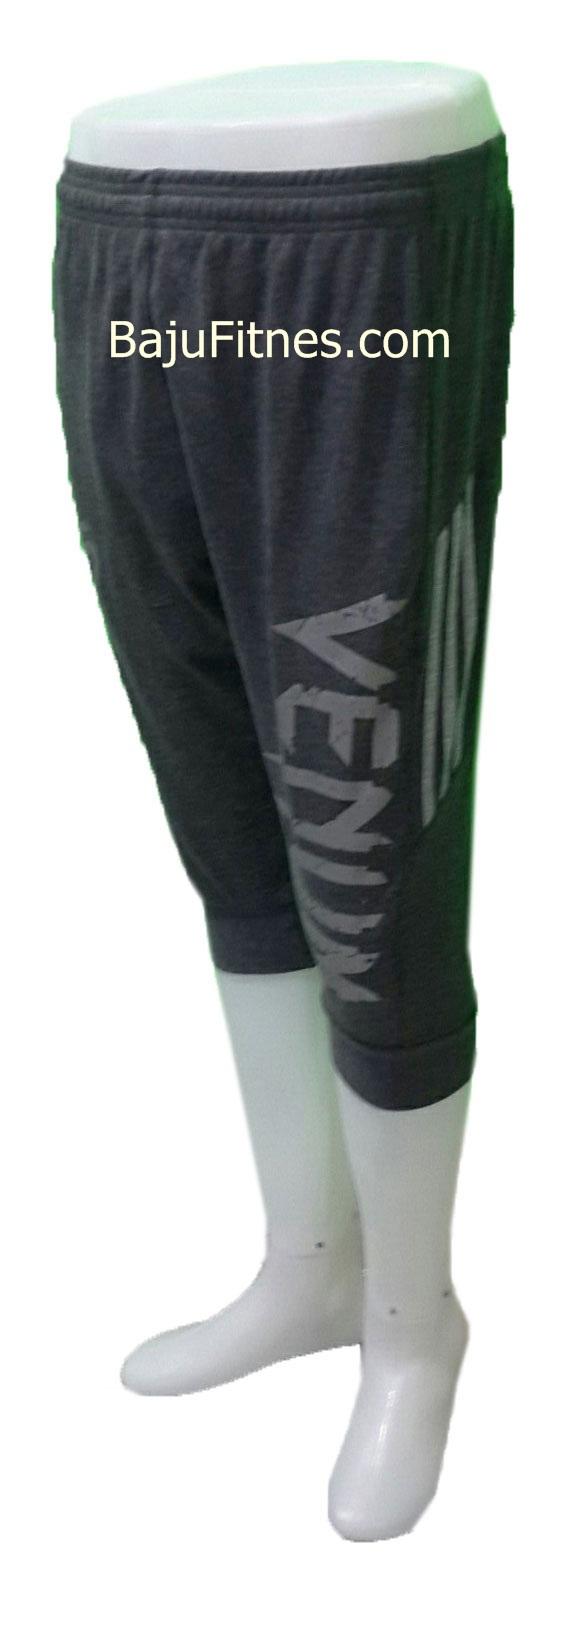 089506541896 Tri | 3549-harga-celana-training-untuk-gymdi-indonesia